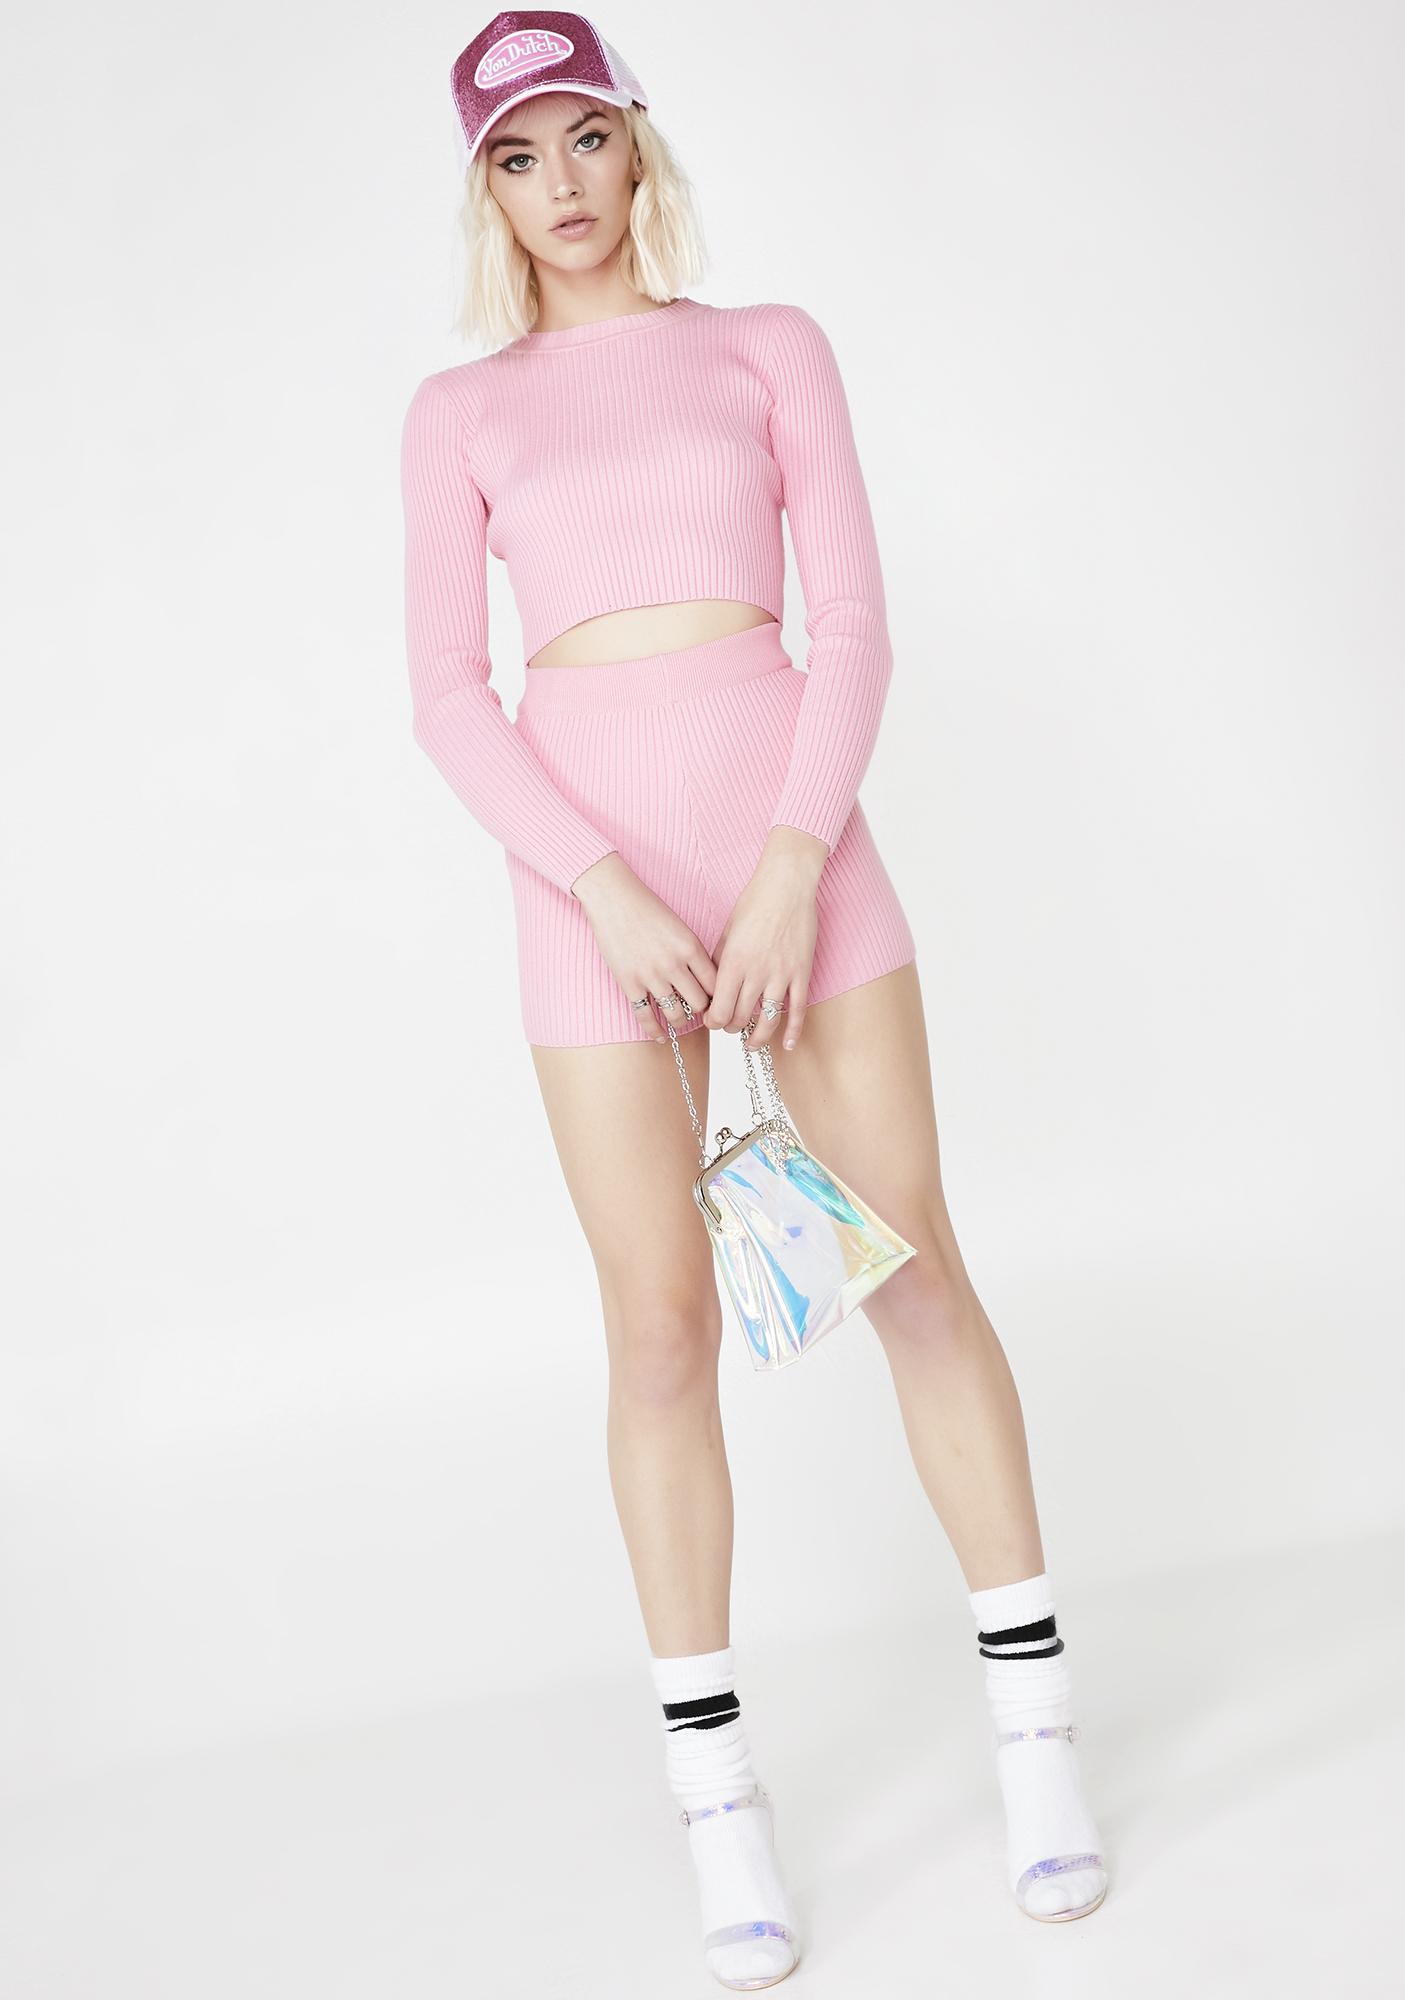 Pixie Melrose Avenue Sweater Set